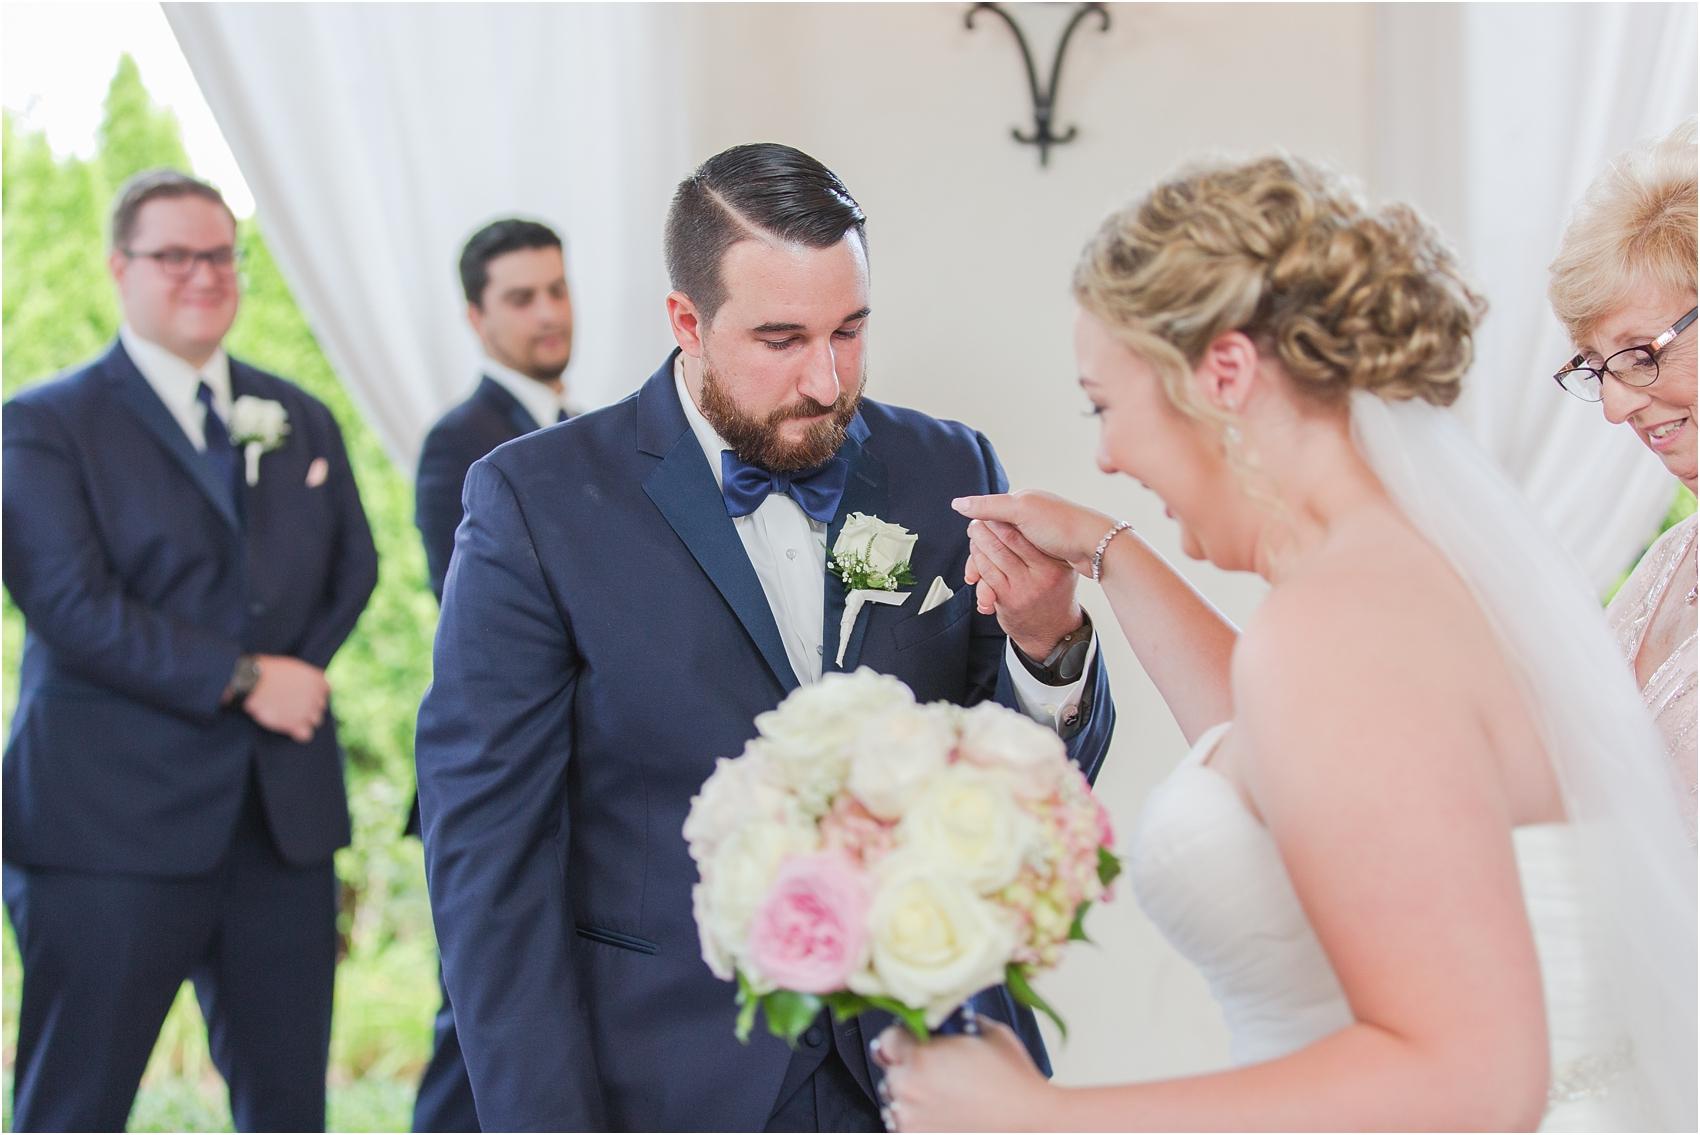 joyful-and-candid-navy-blush-wedding-photos-at-crystal-gardens-in-howell-mi-by-courtney-carolyn-photography_0034.jpg